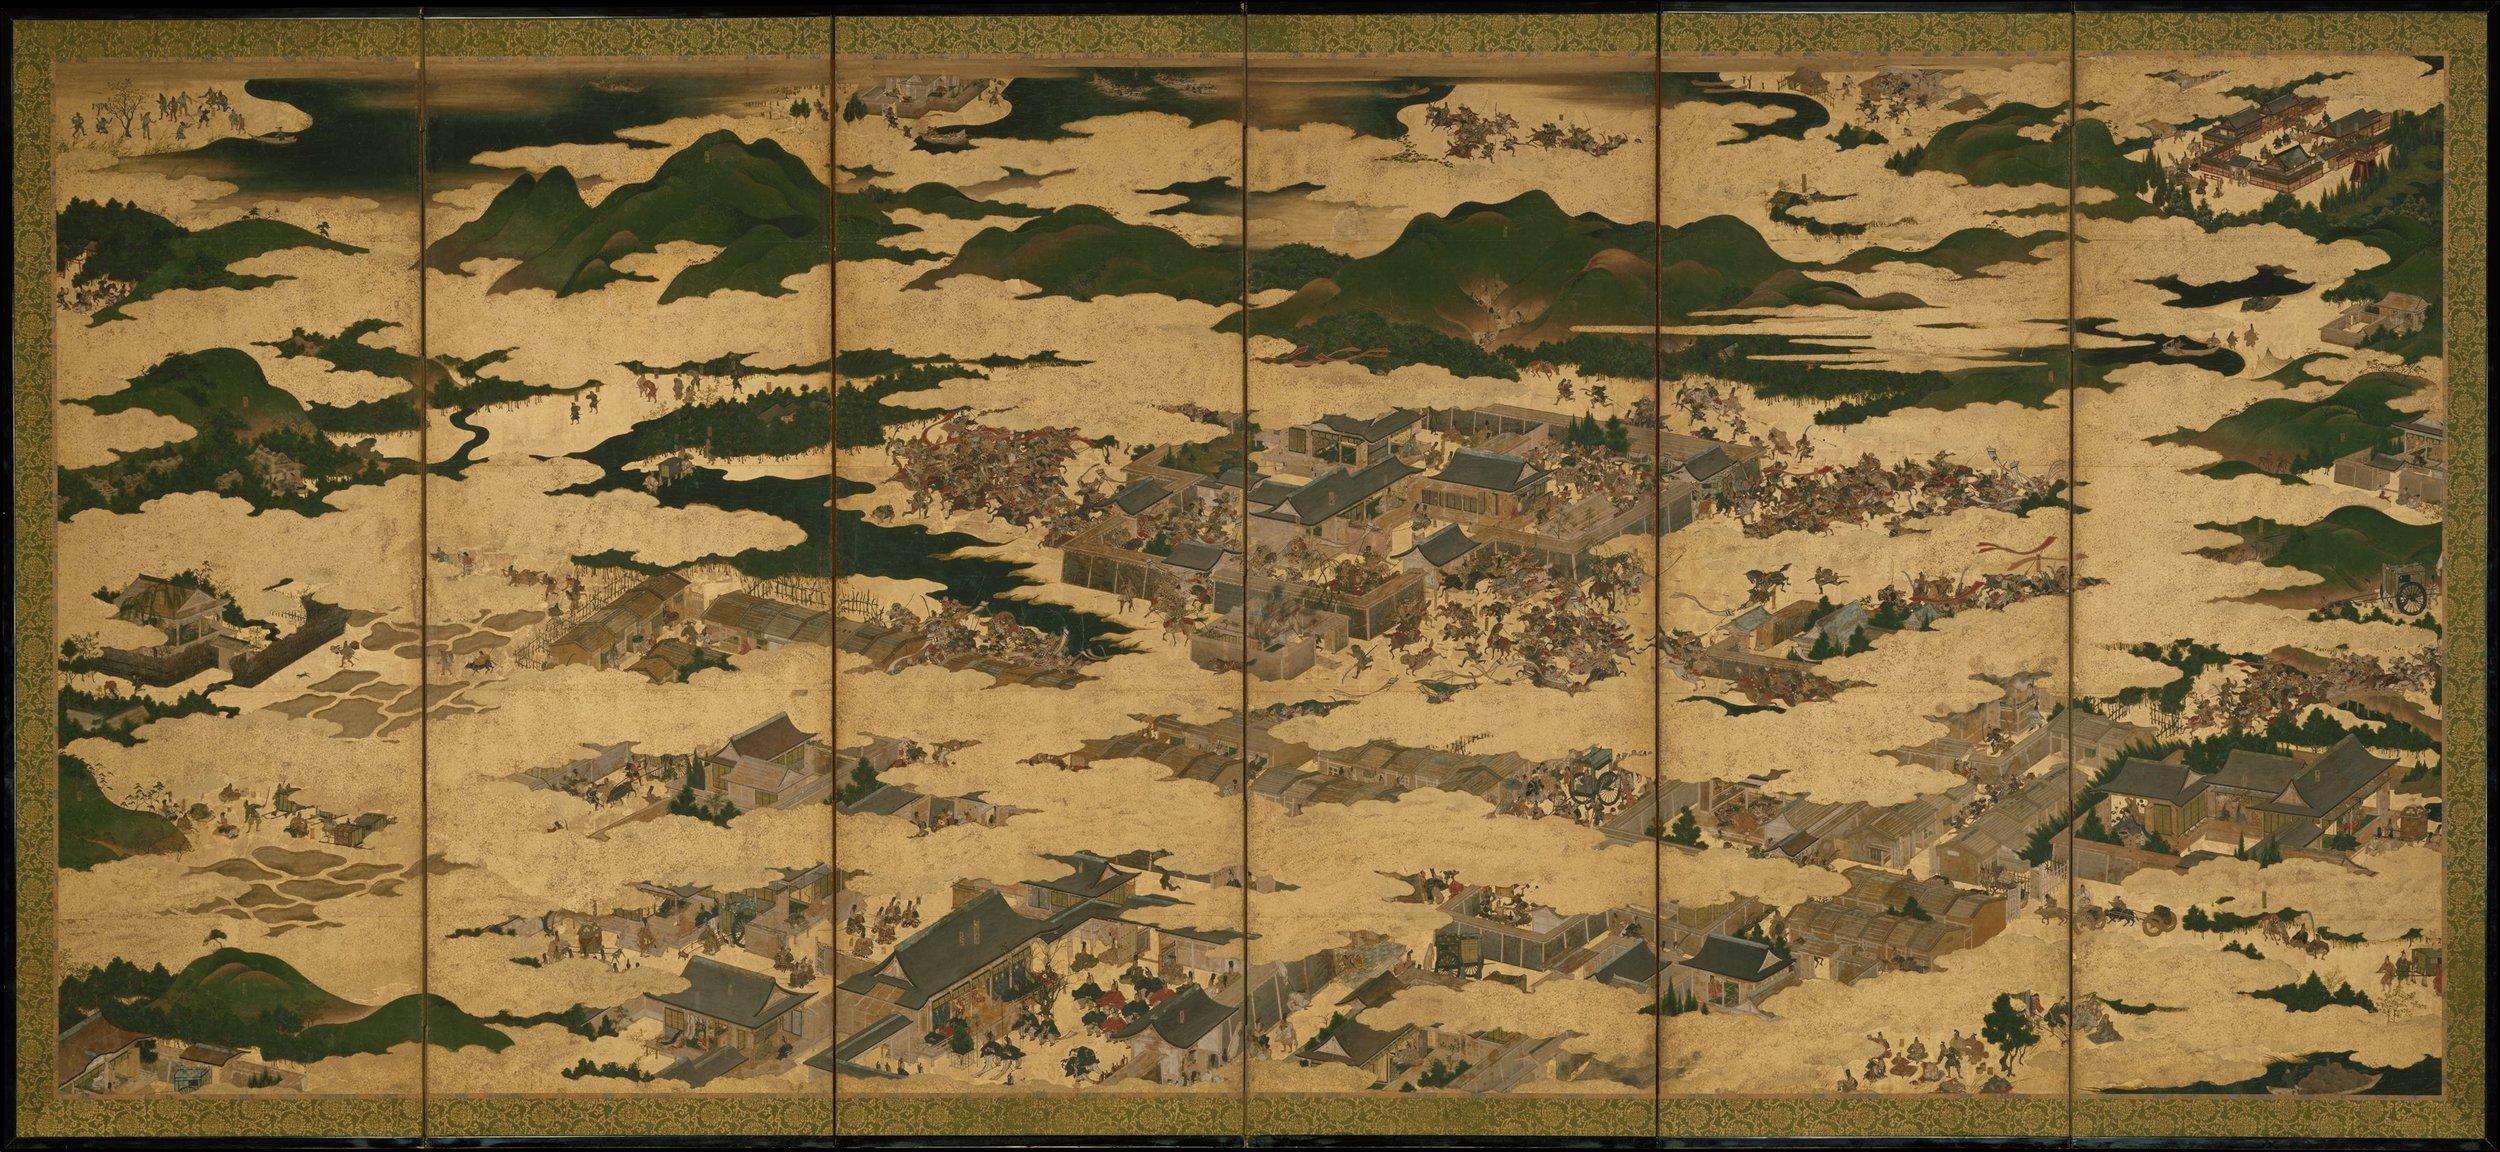 保元平治合戦図屏風 The Rebellions of the Hōgen and Heiji Eras,17th century. Metropolitan Museum of Art, New York.